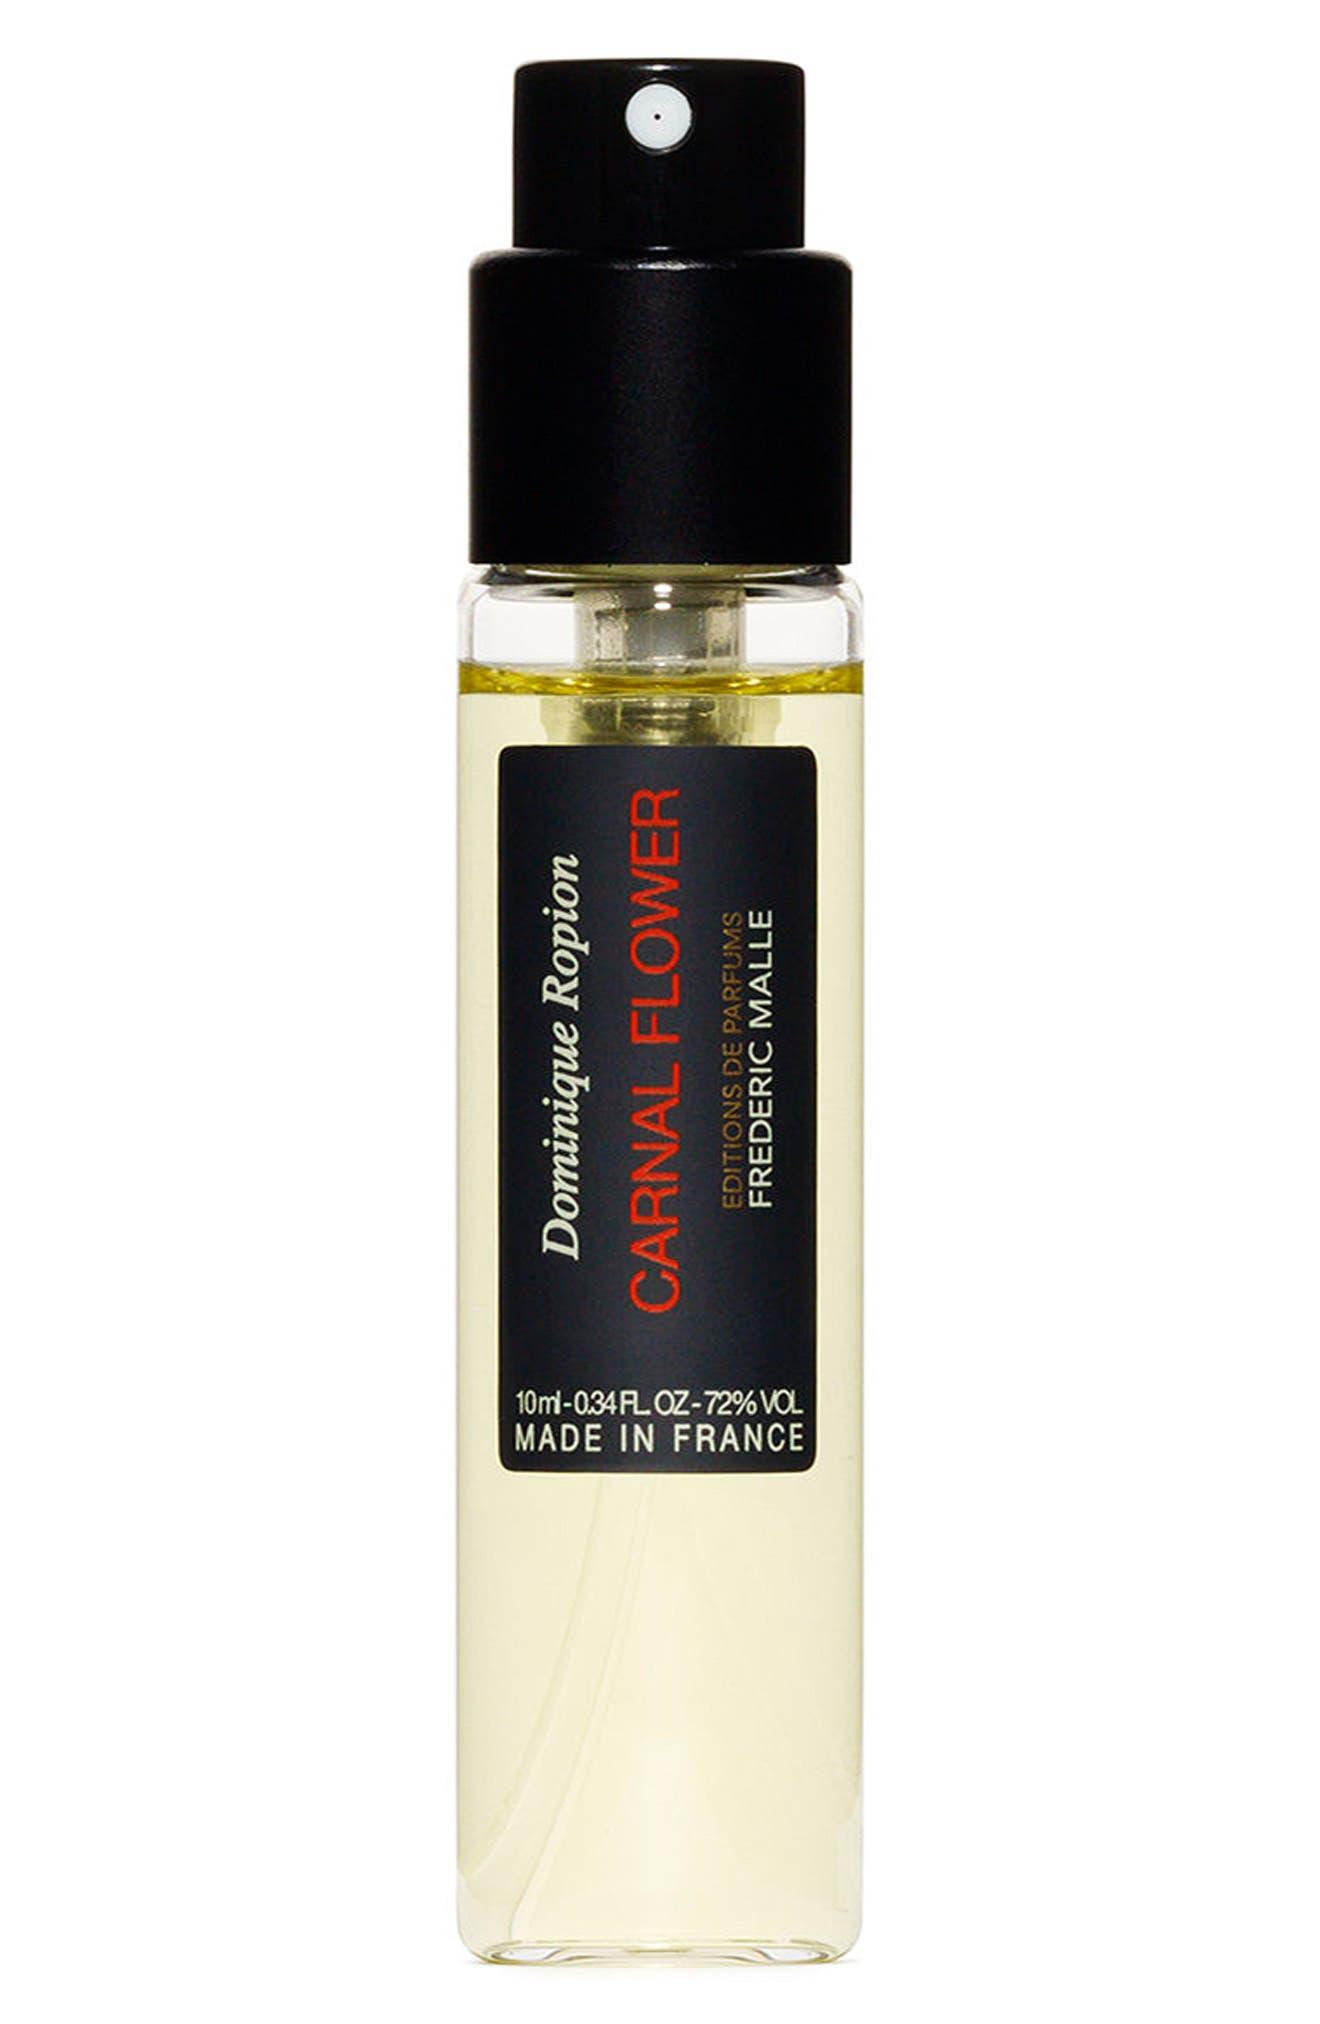 Editions de Parfums Frédéric Malle Carnal Flower Travel Spray & Case